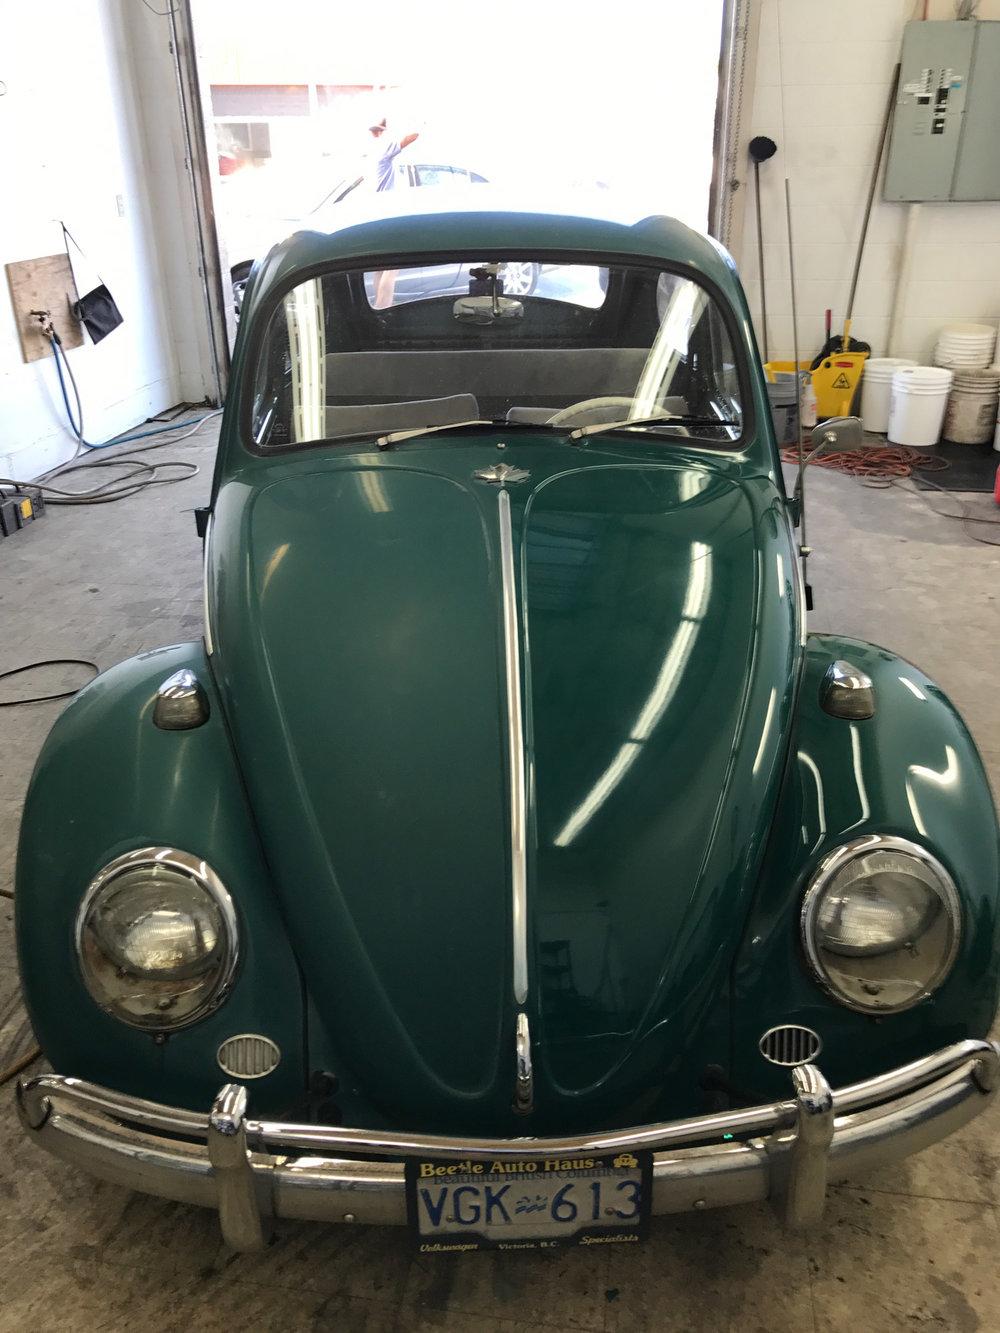 Prestige-VW-Jun-26-2017-(1)_web.jpg